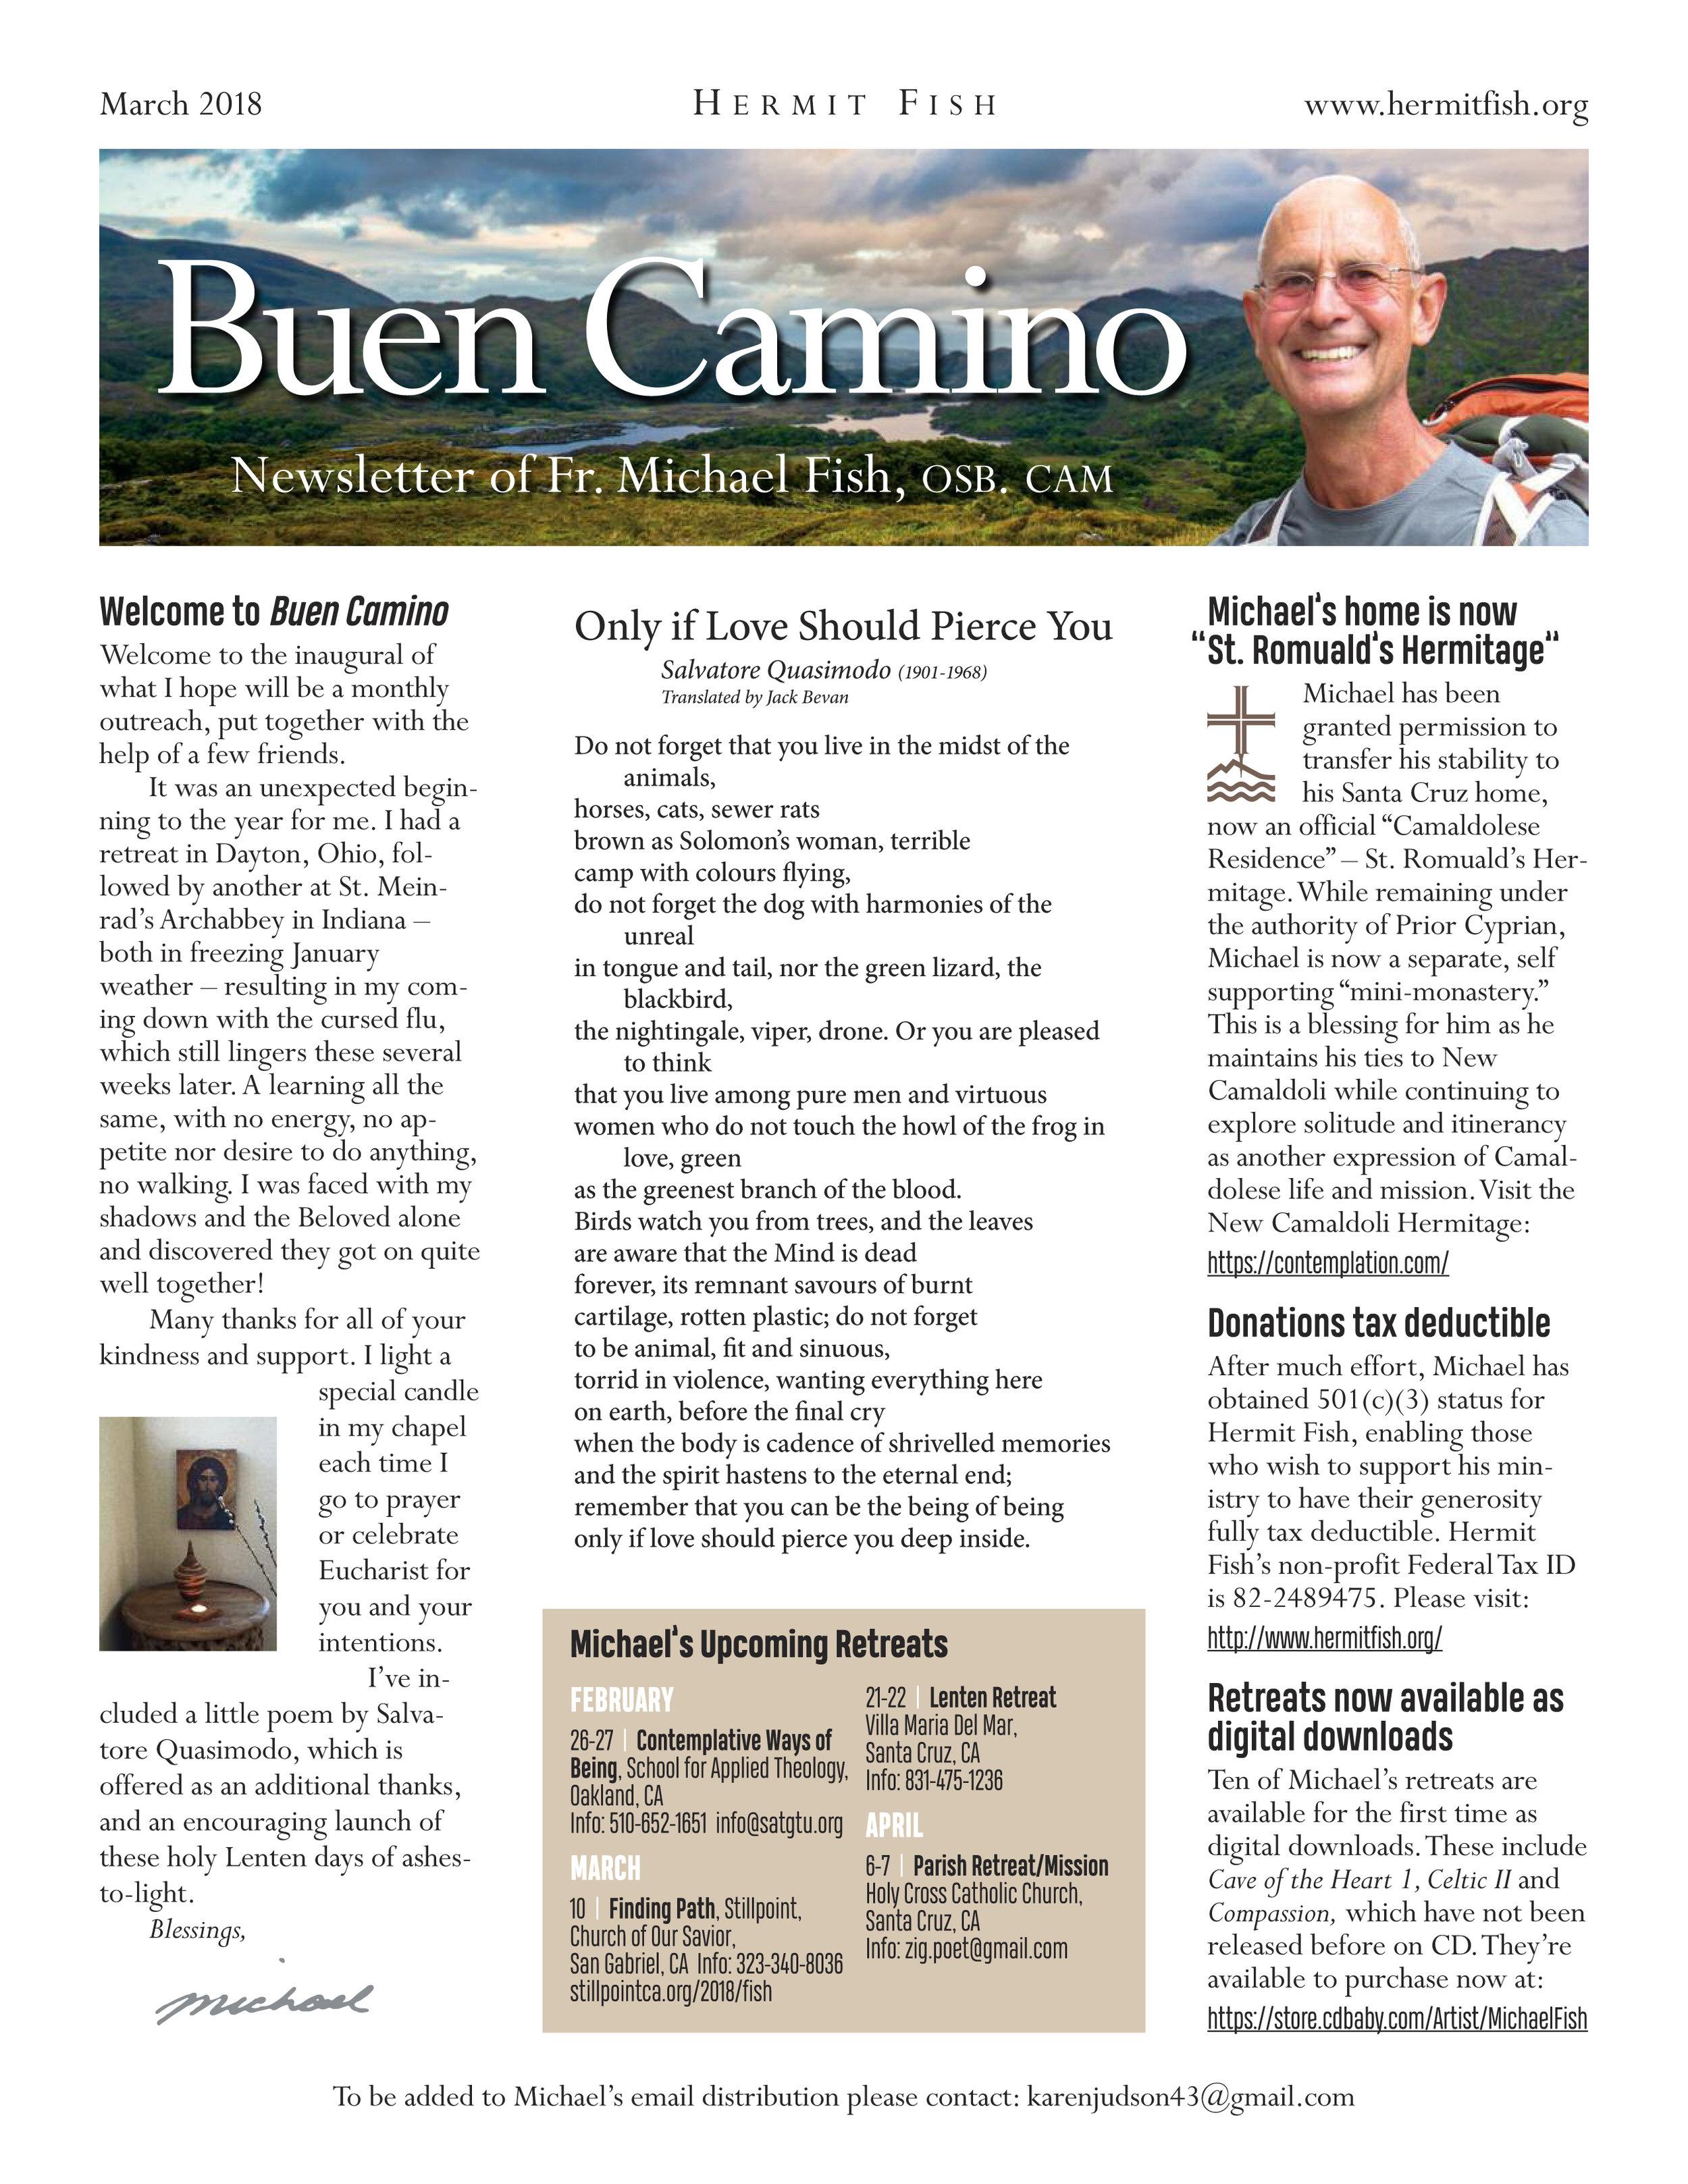 Buen Camino March 2018.jpg